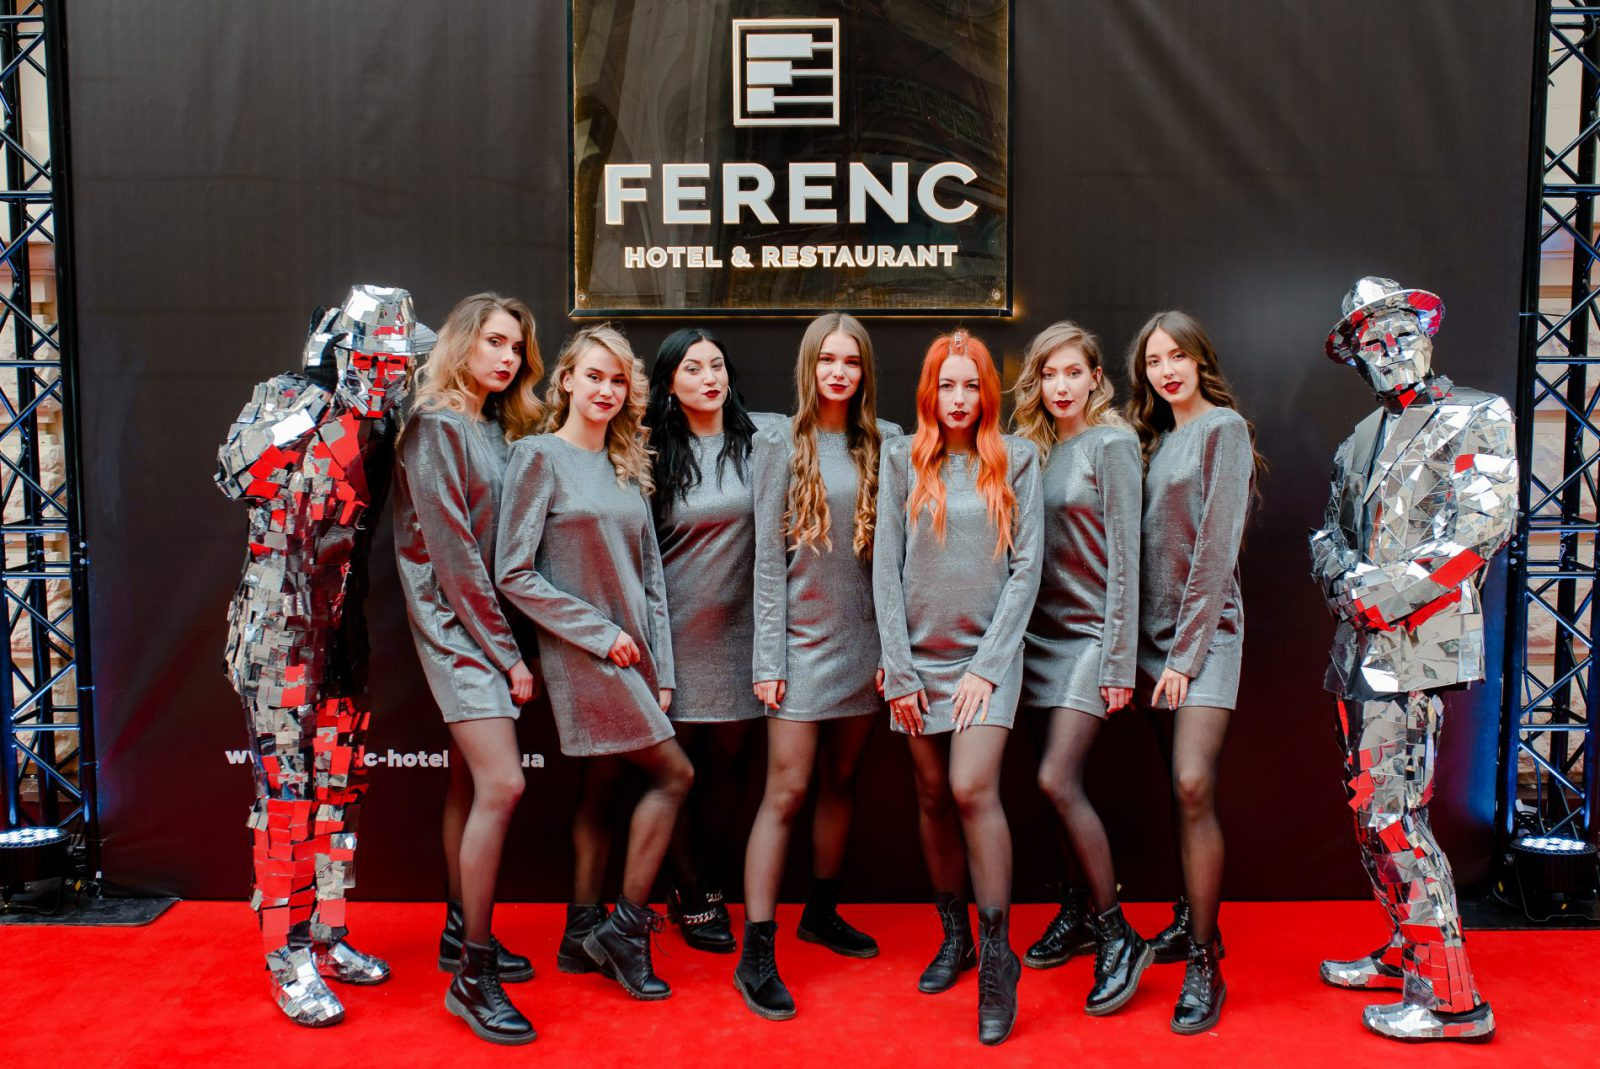 Ferenc0198